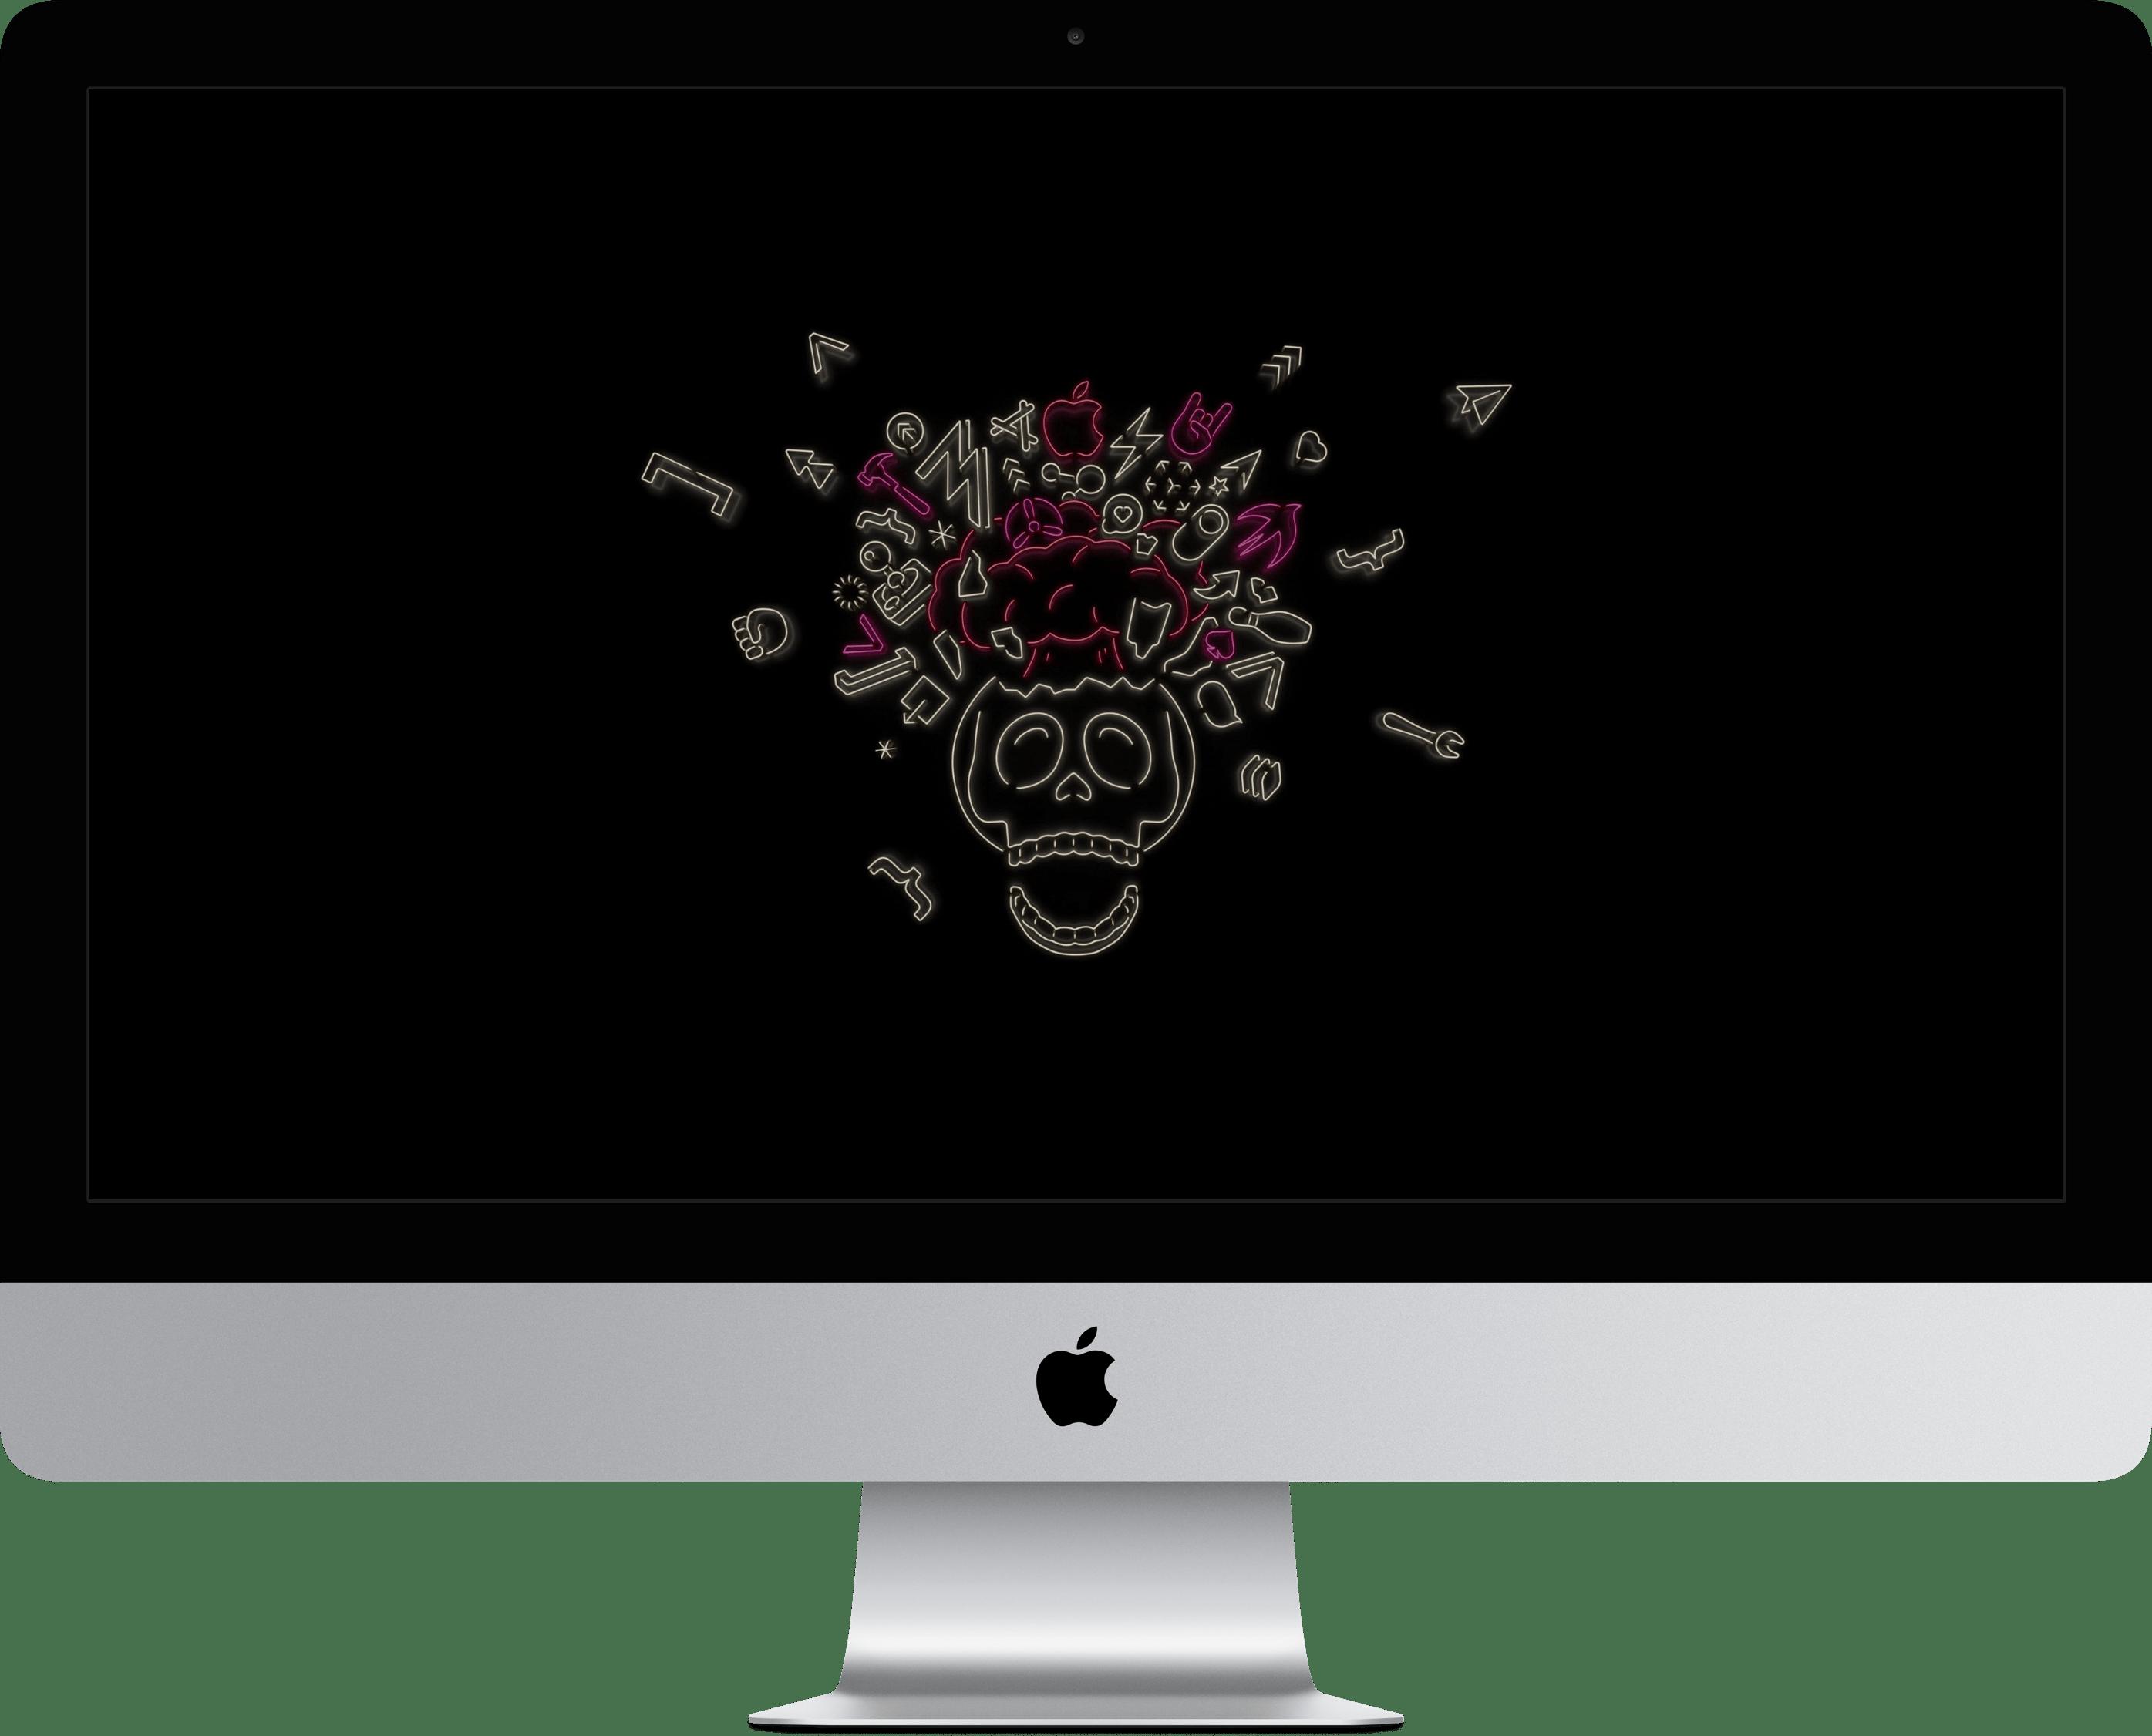 Wallpapers da WWDC19 em iMac